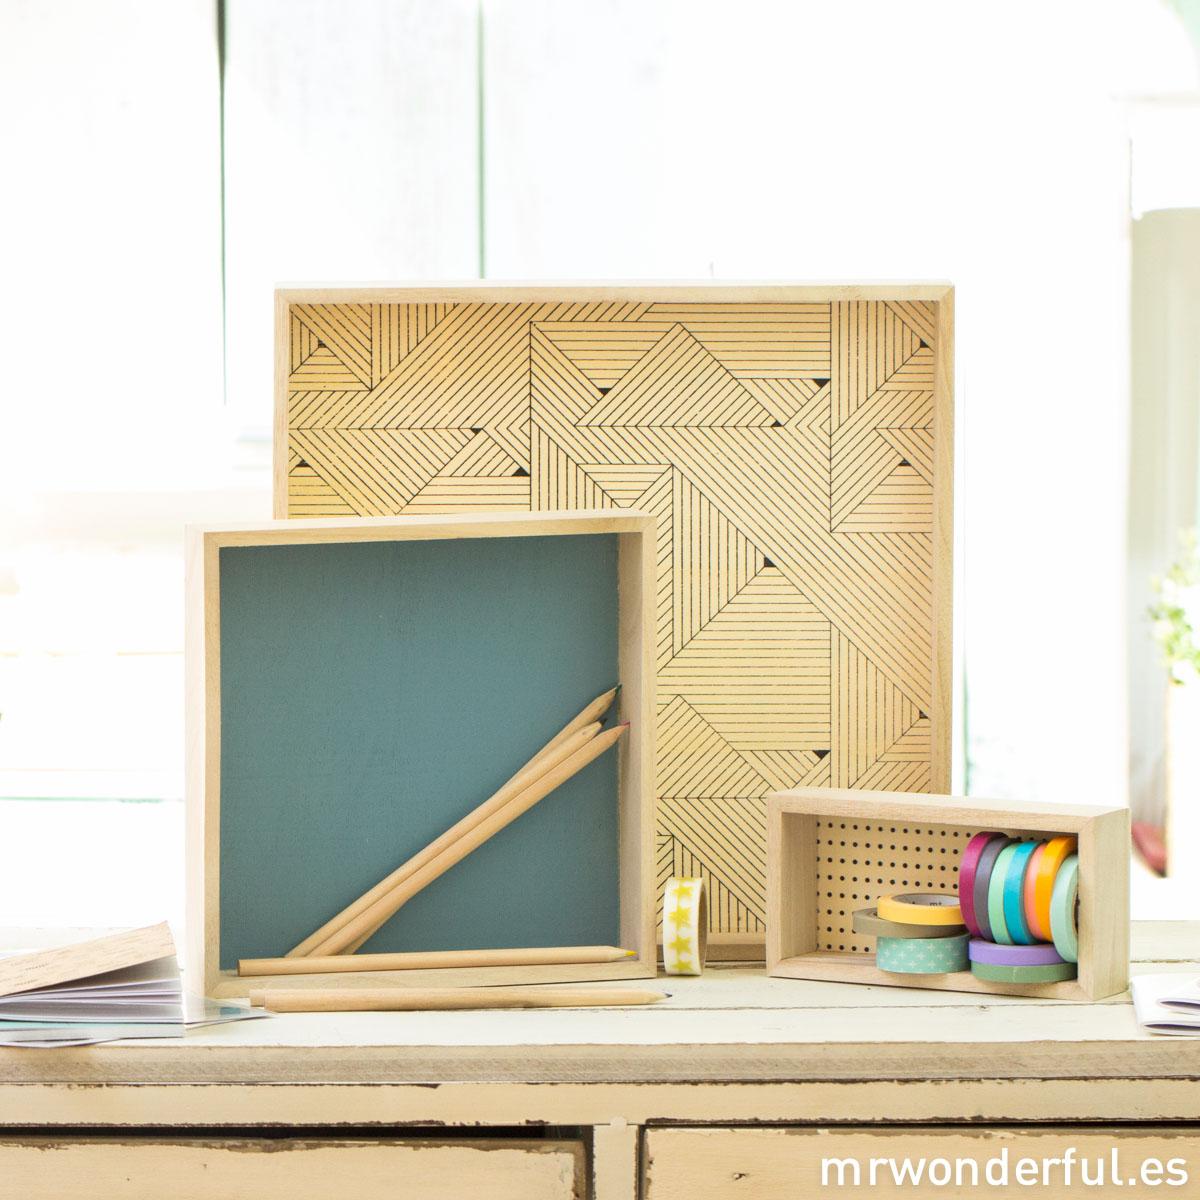 mrwonderful_SU0225_set-3-bandejas-madera-geometricas-4